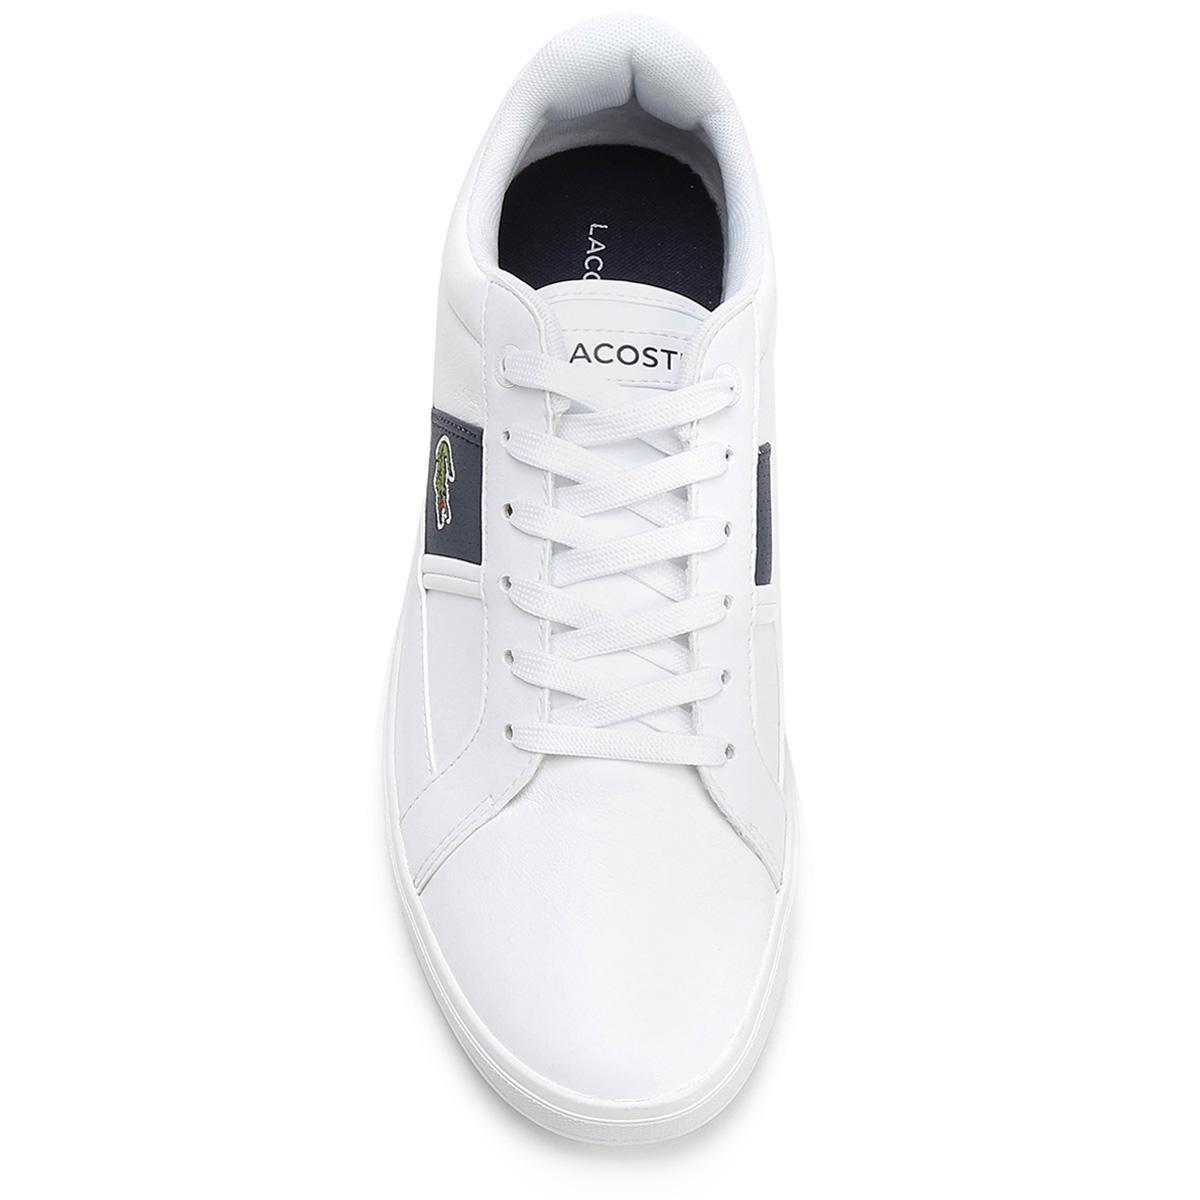 8d8fe948e17c6 Tênis Lacoste Europa Lcr3 - Branco - Compre Agora   Netshoes